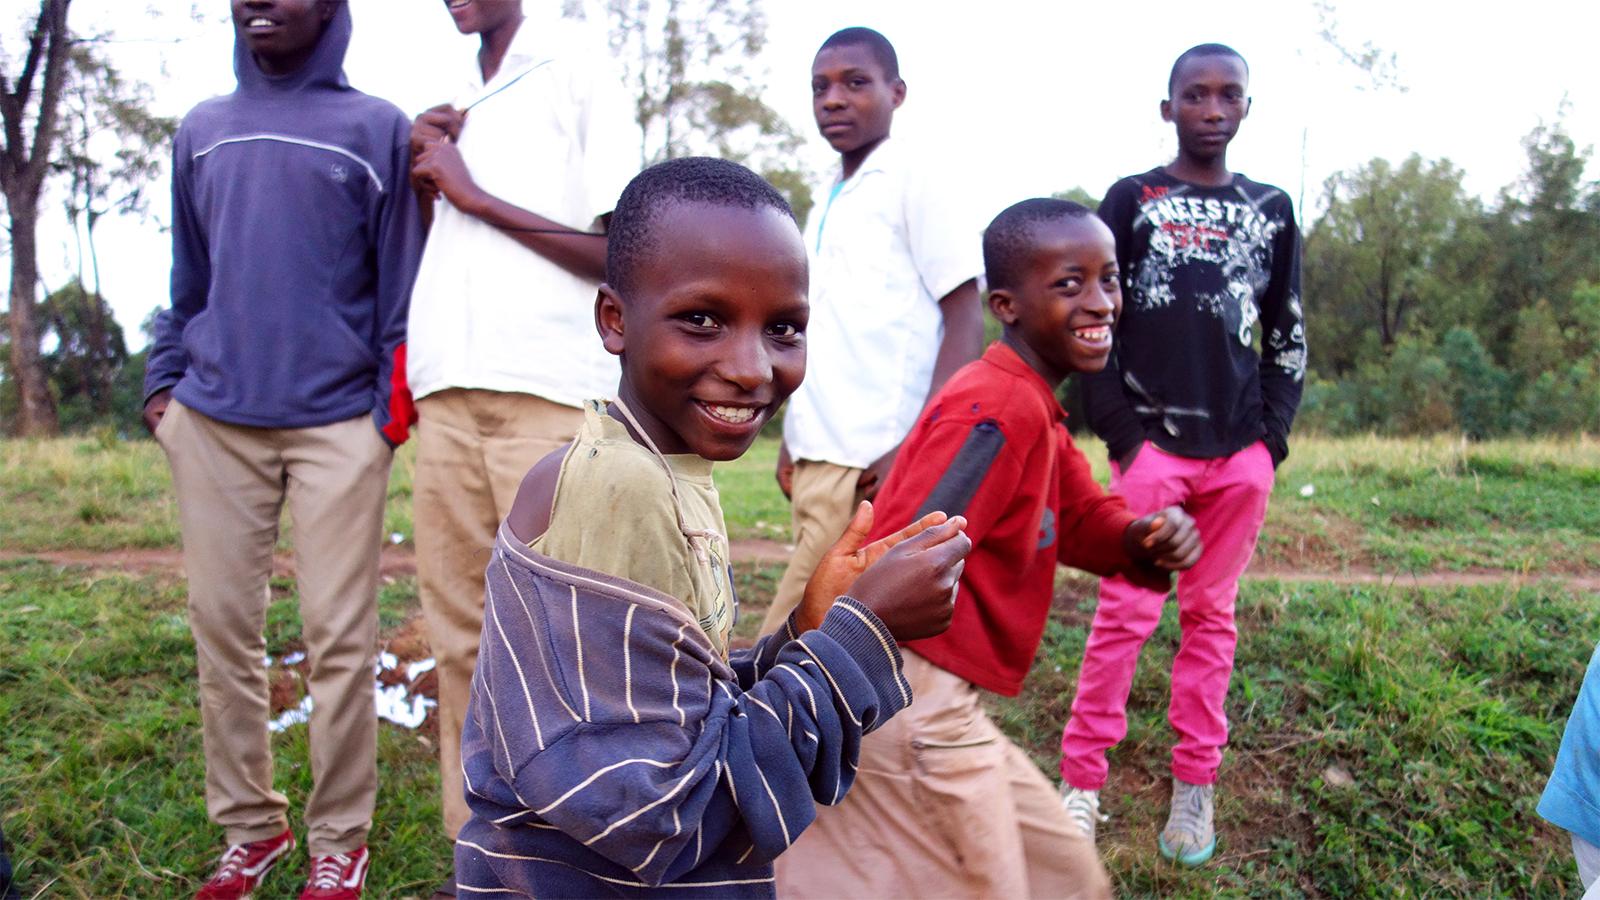 GACollaborative_MLSC_Children-02_1600.jpg